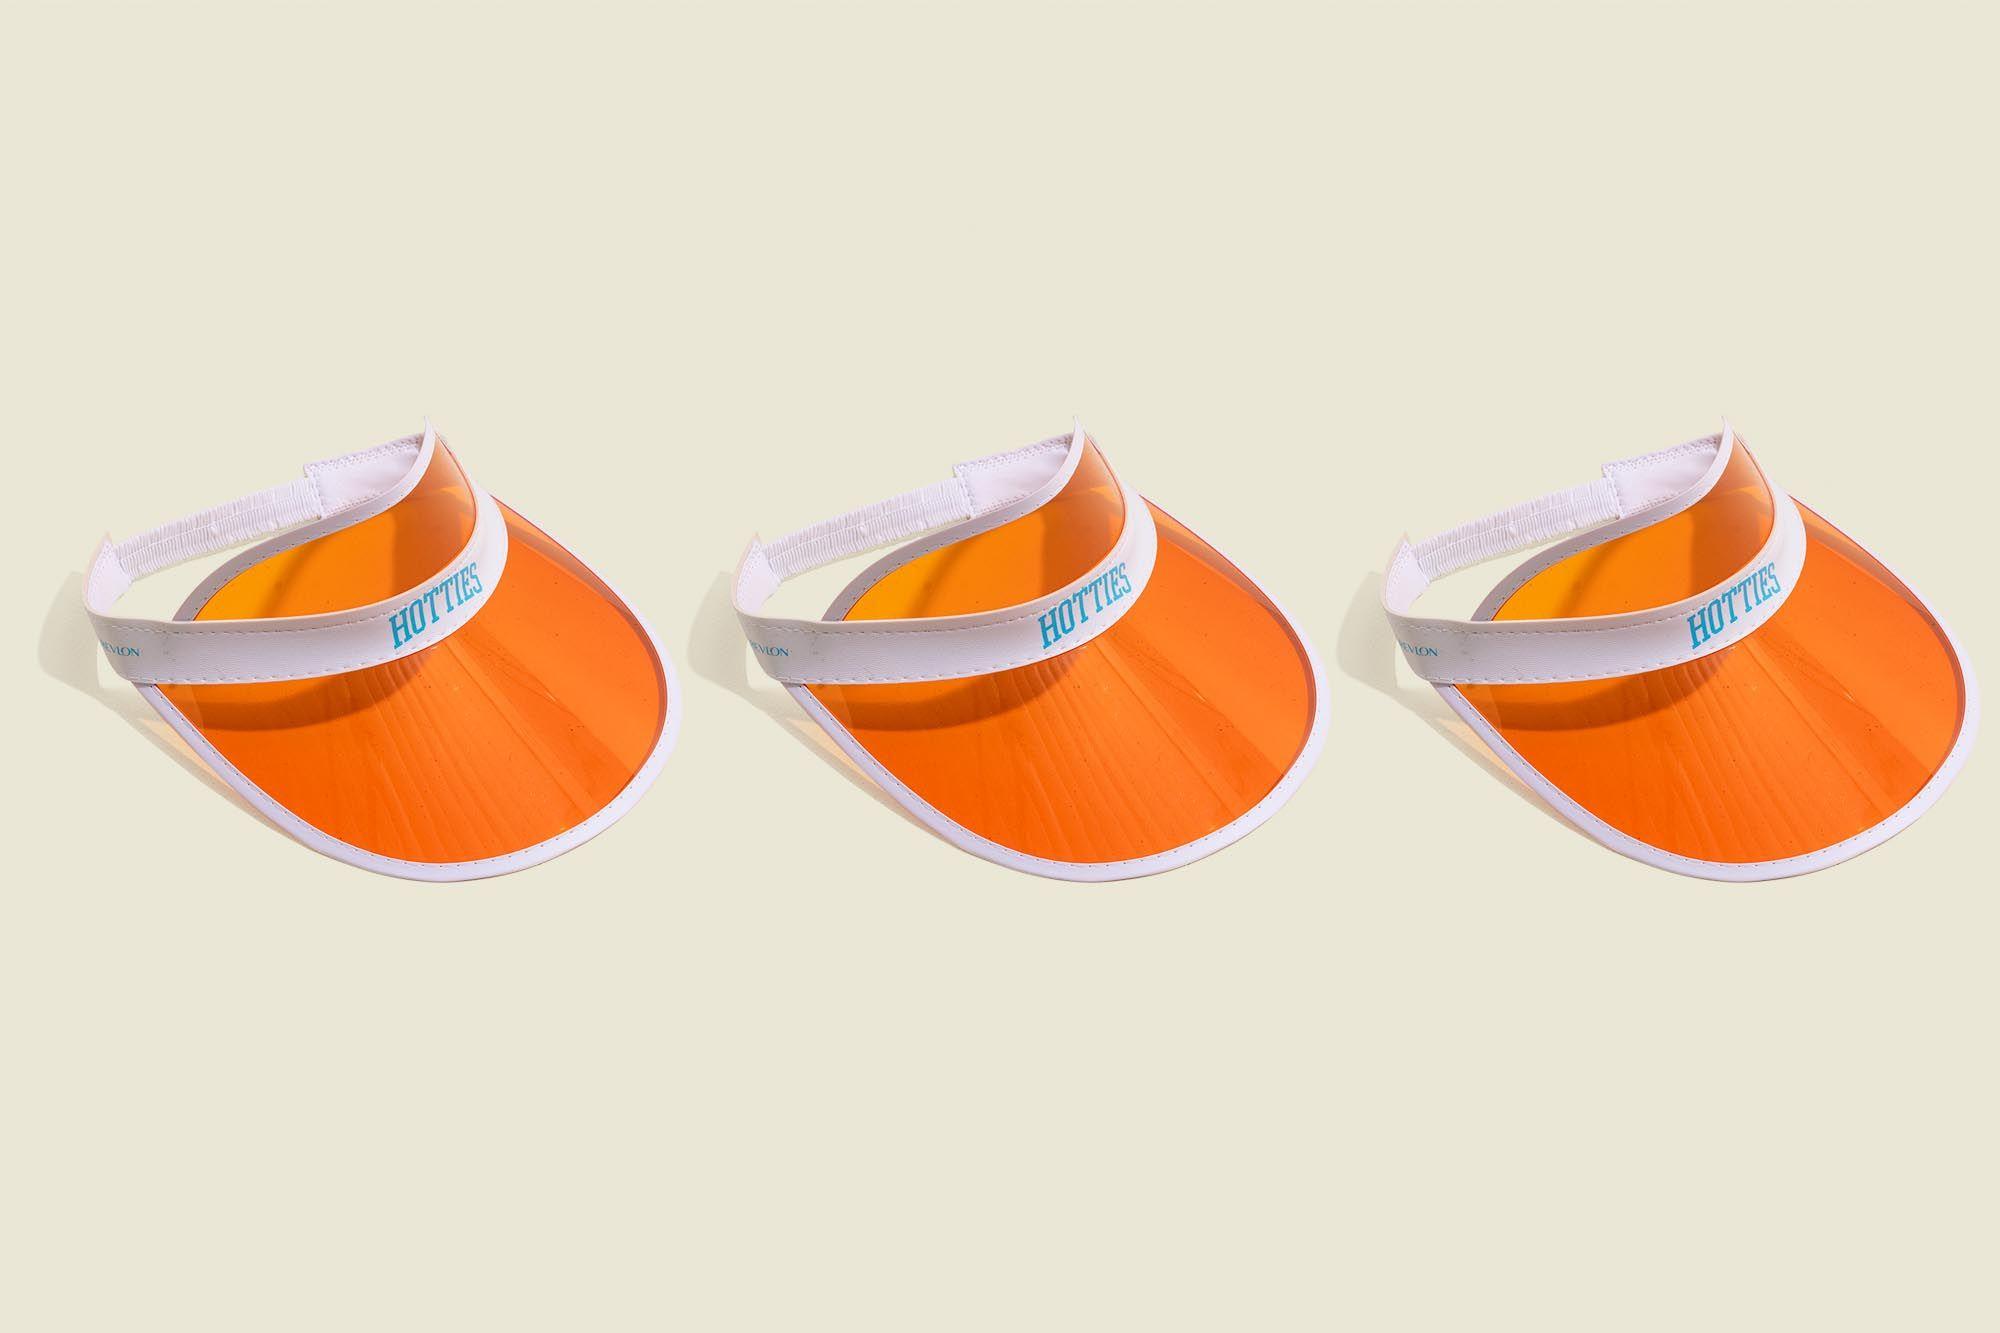 Set of visor hats